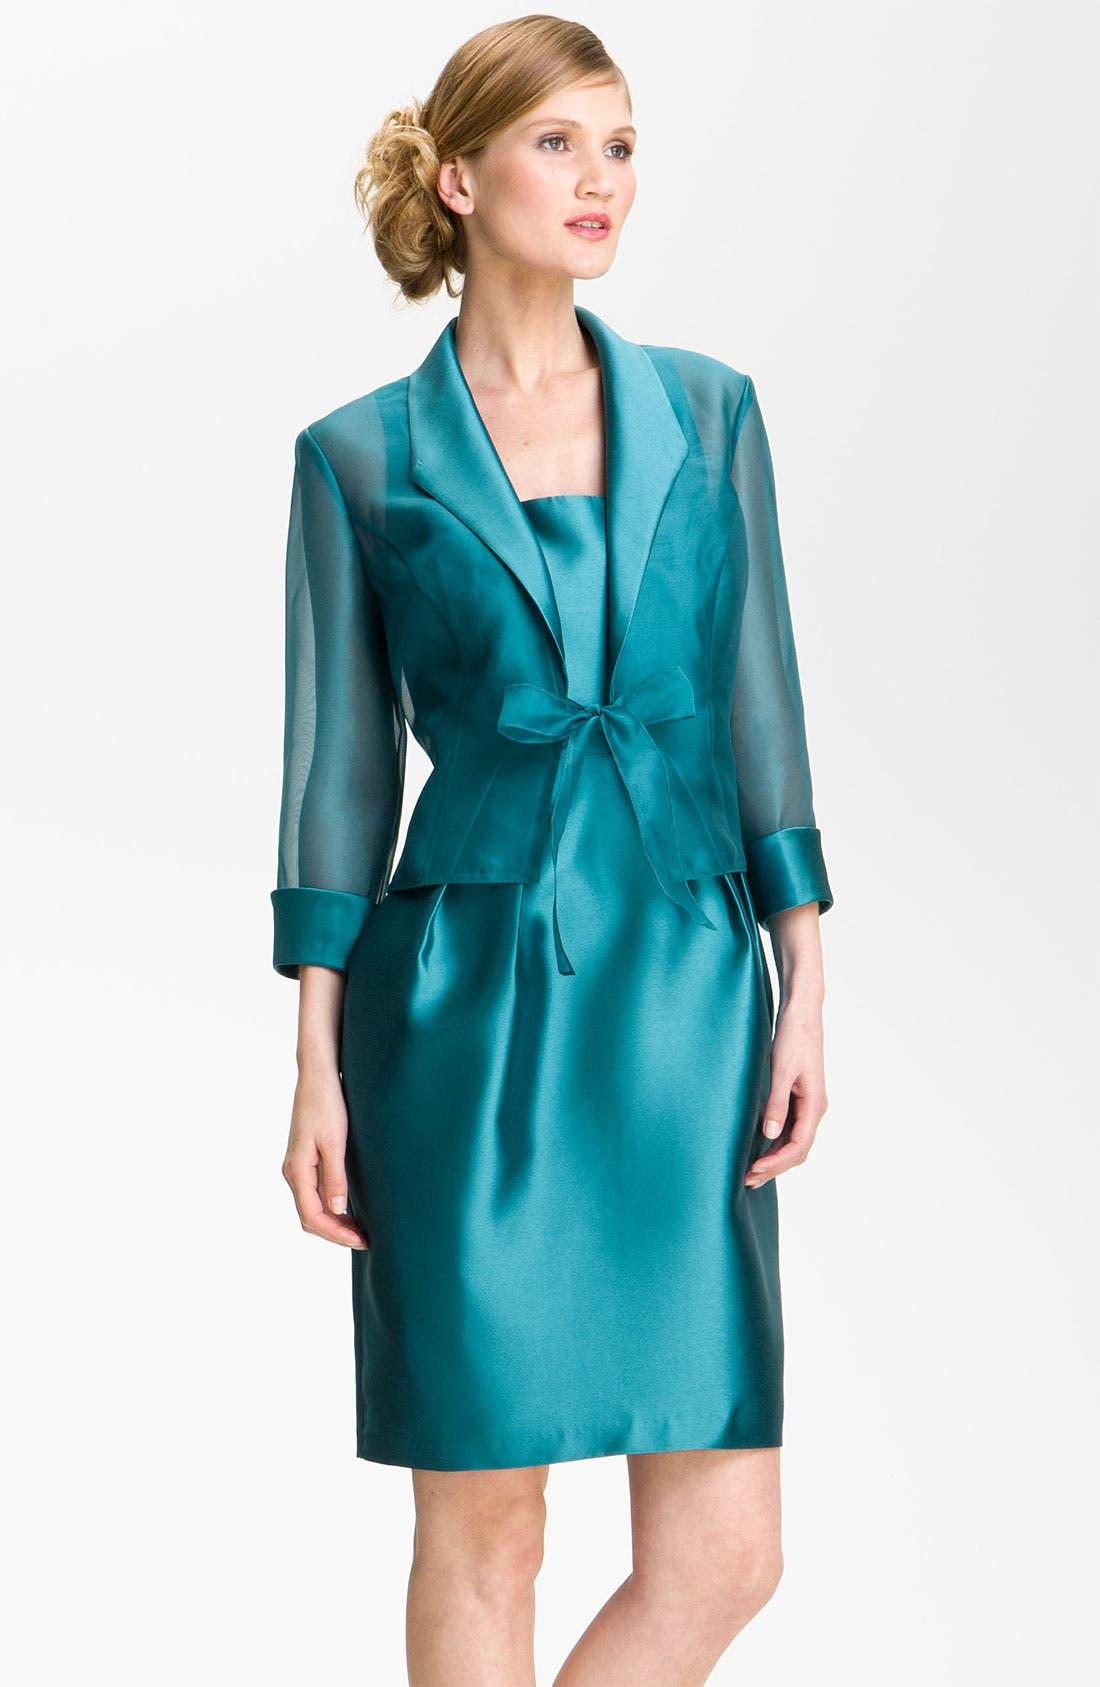 Main Image - Alex Evenings Square Neck Sheath Dress & Jacket